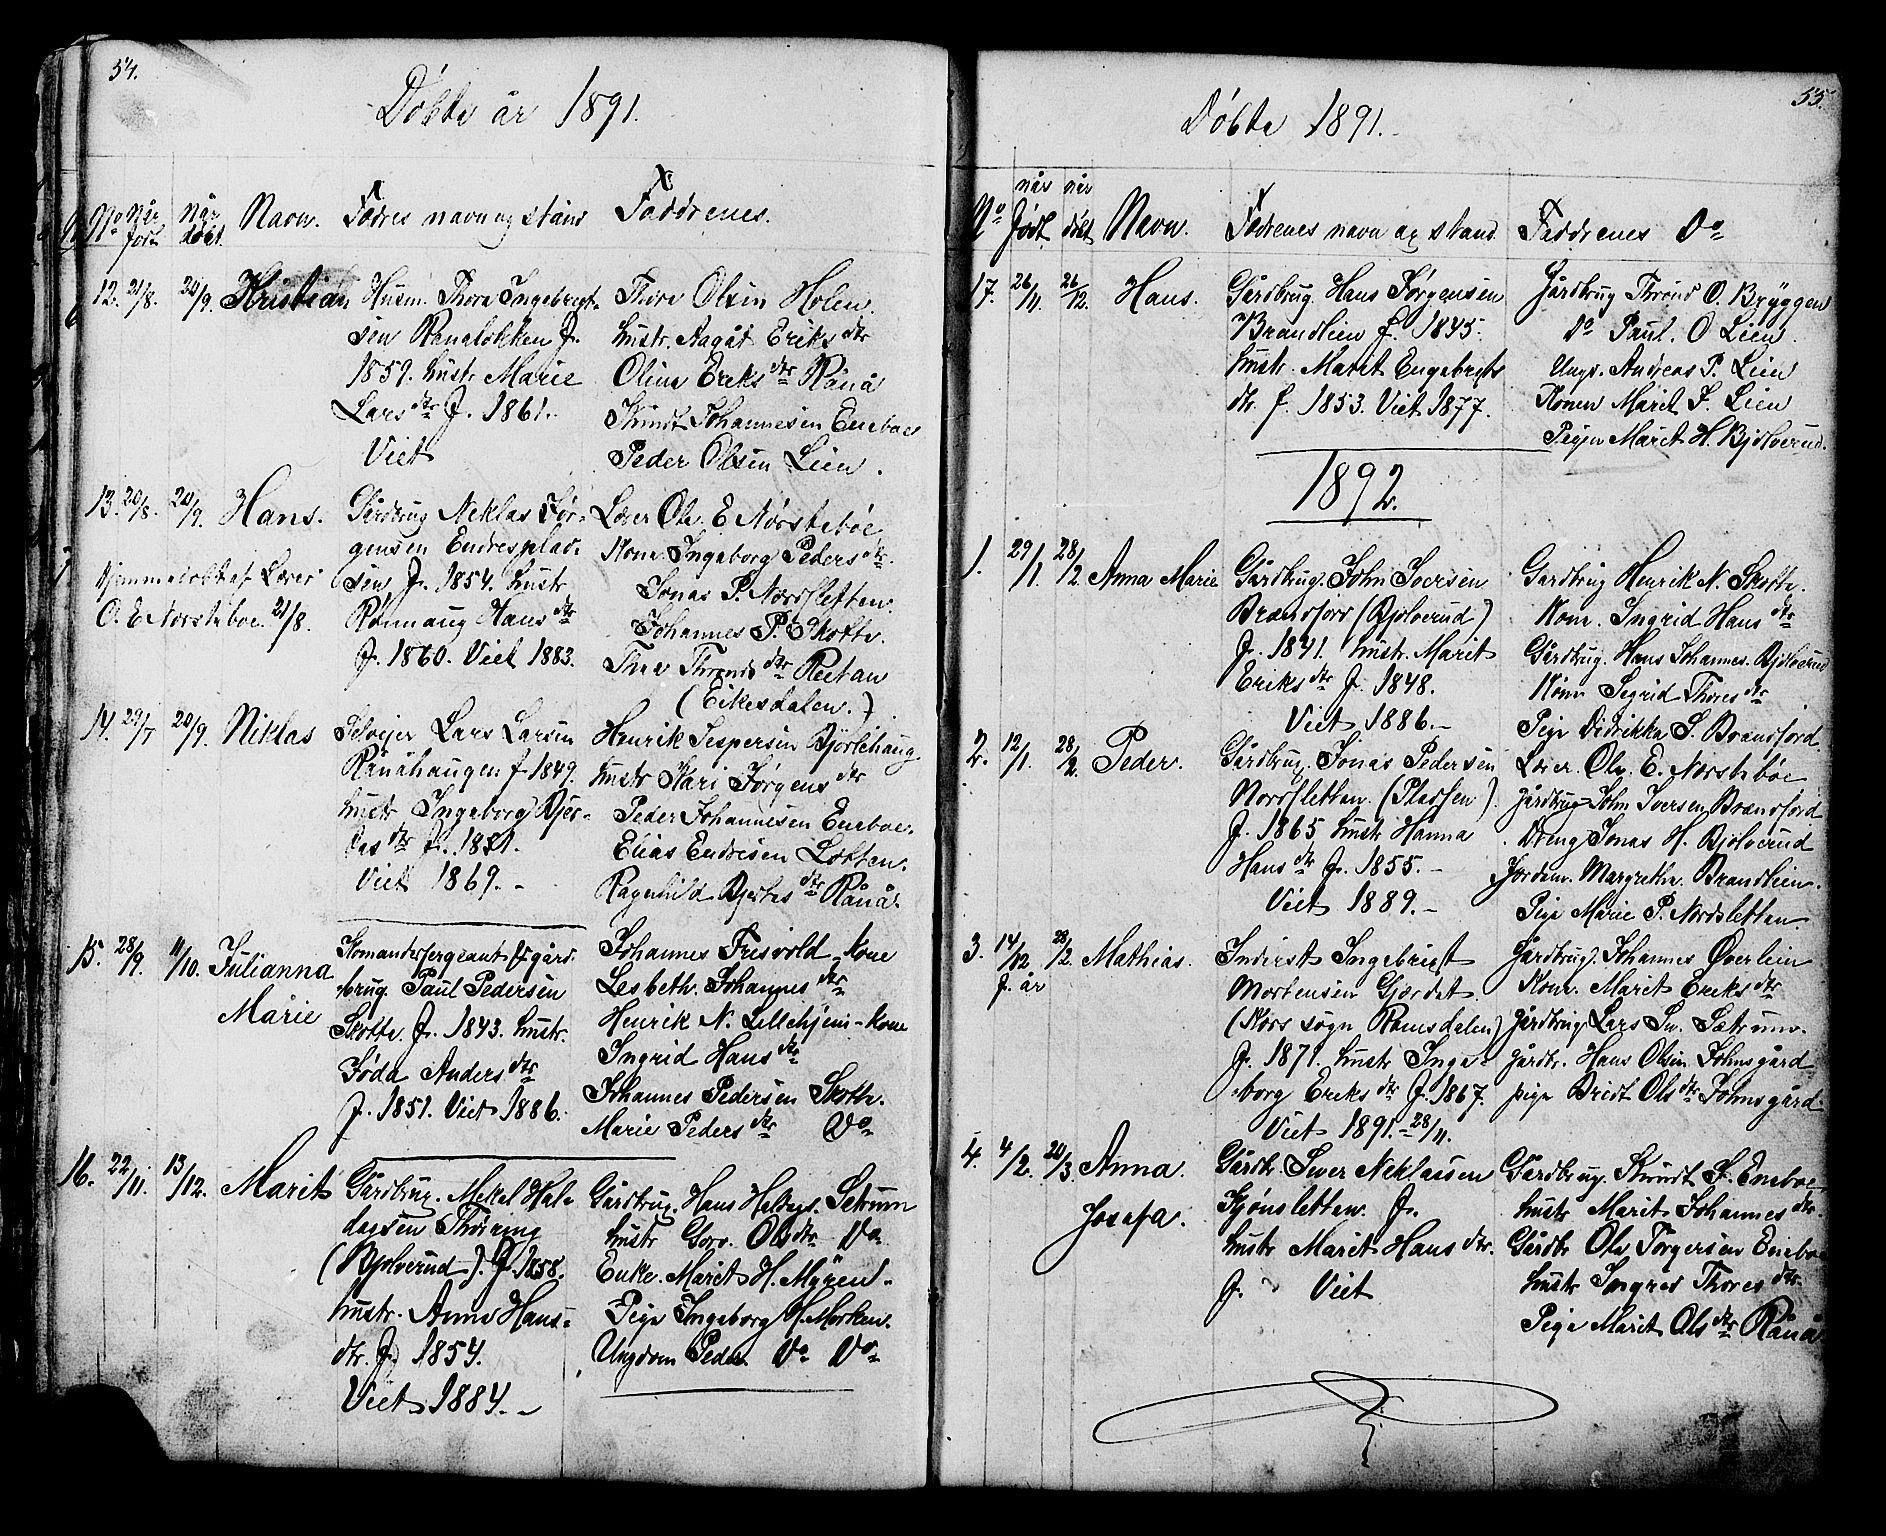 SAH, Lesja prestekontor, Klokkerbok nr. 6, 1871-1904, s. 54-55